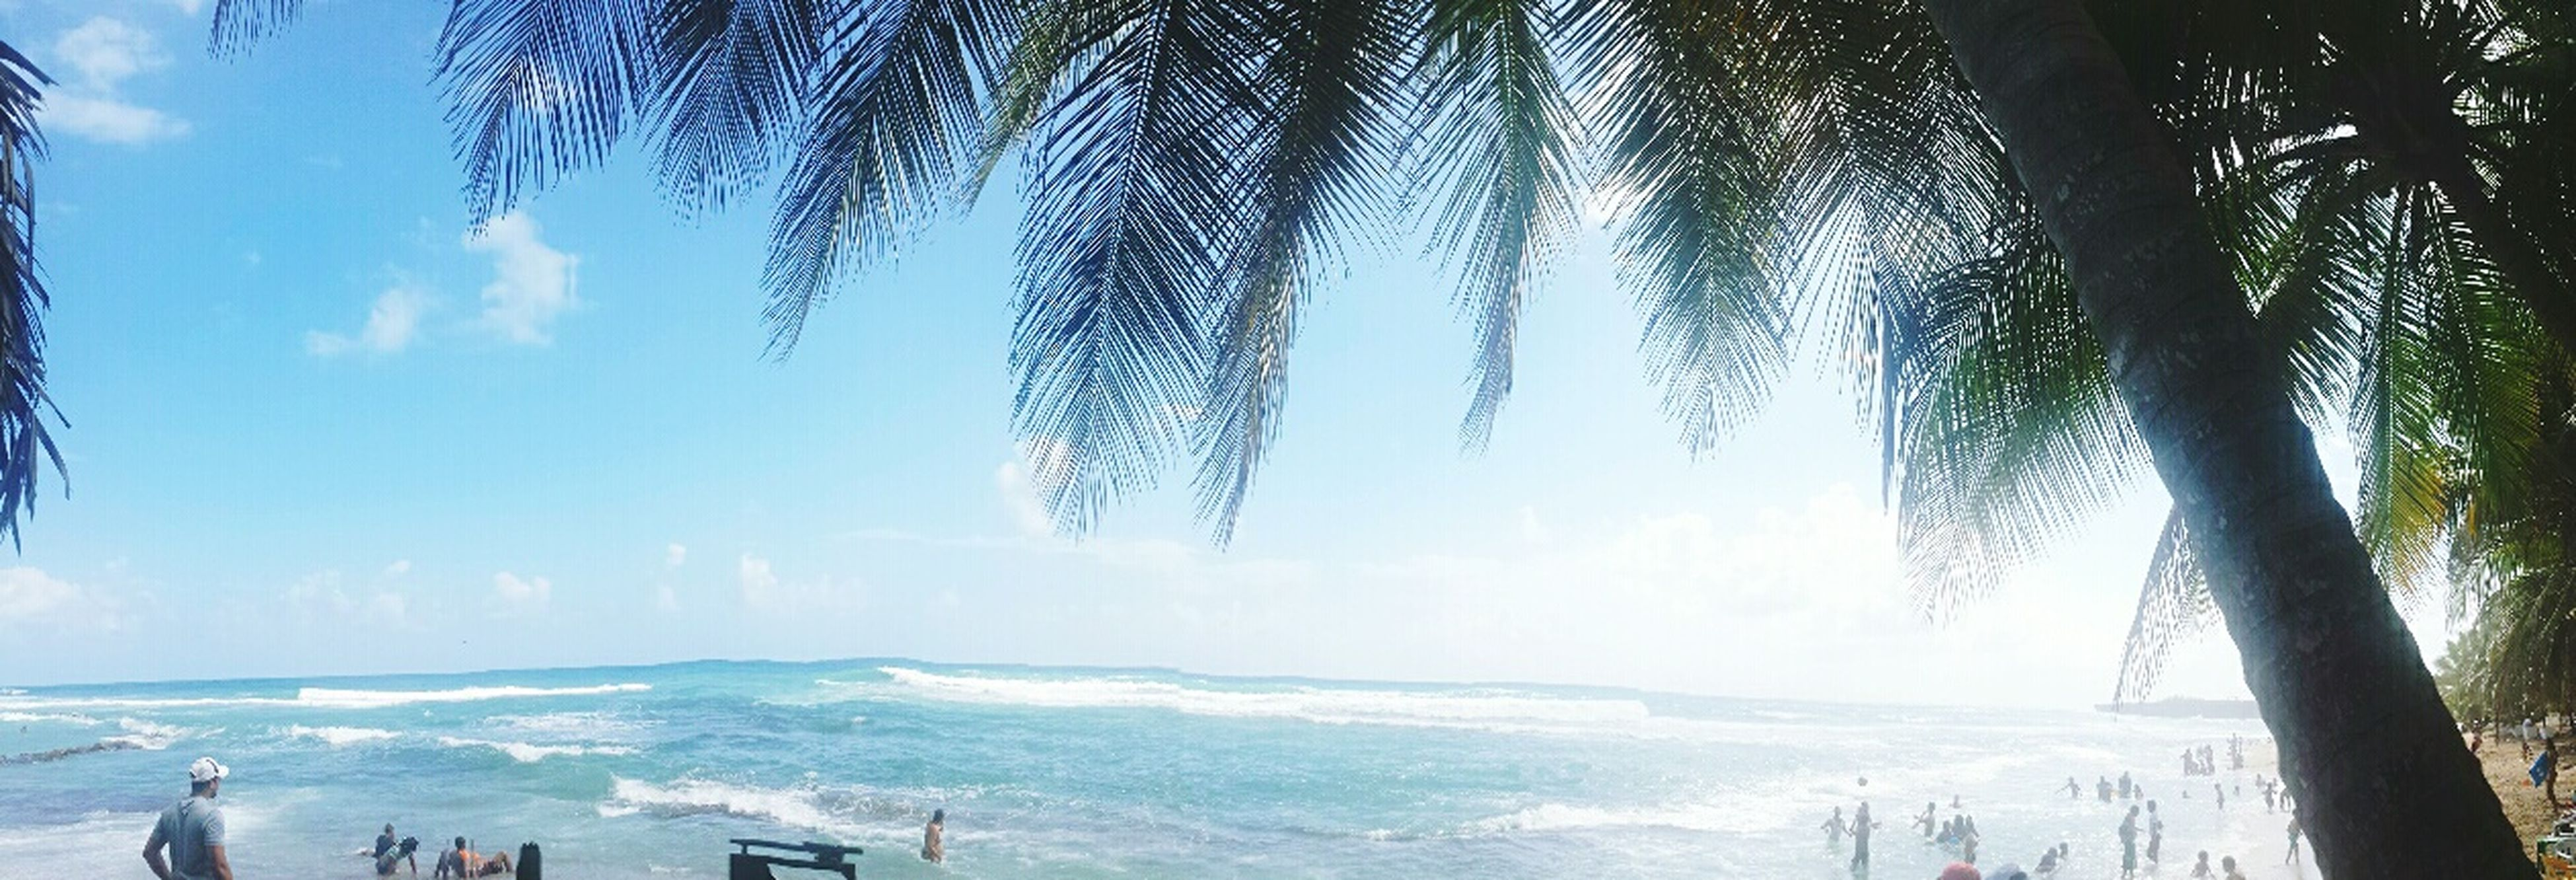 Beauty inland Lovingmycountry Caribbeangirl Welcometotheheaven DRfortheworld🌴 First Eyeem Photo